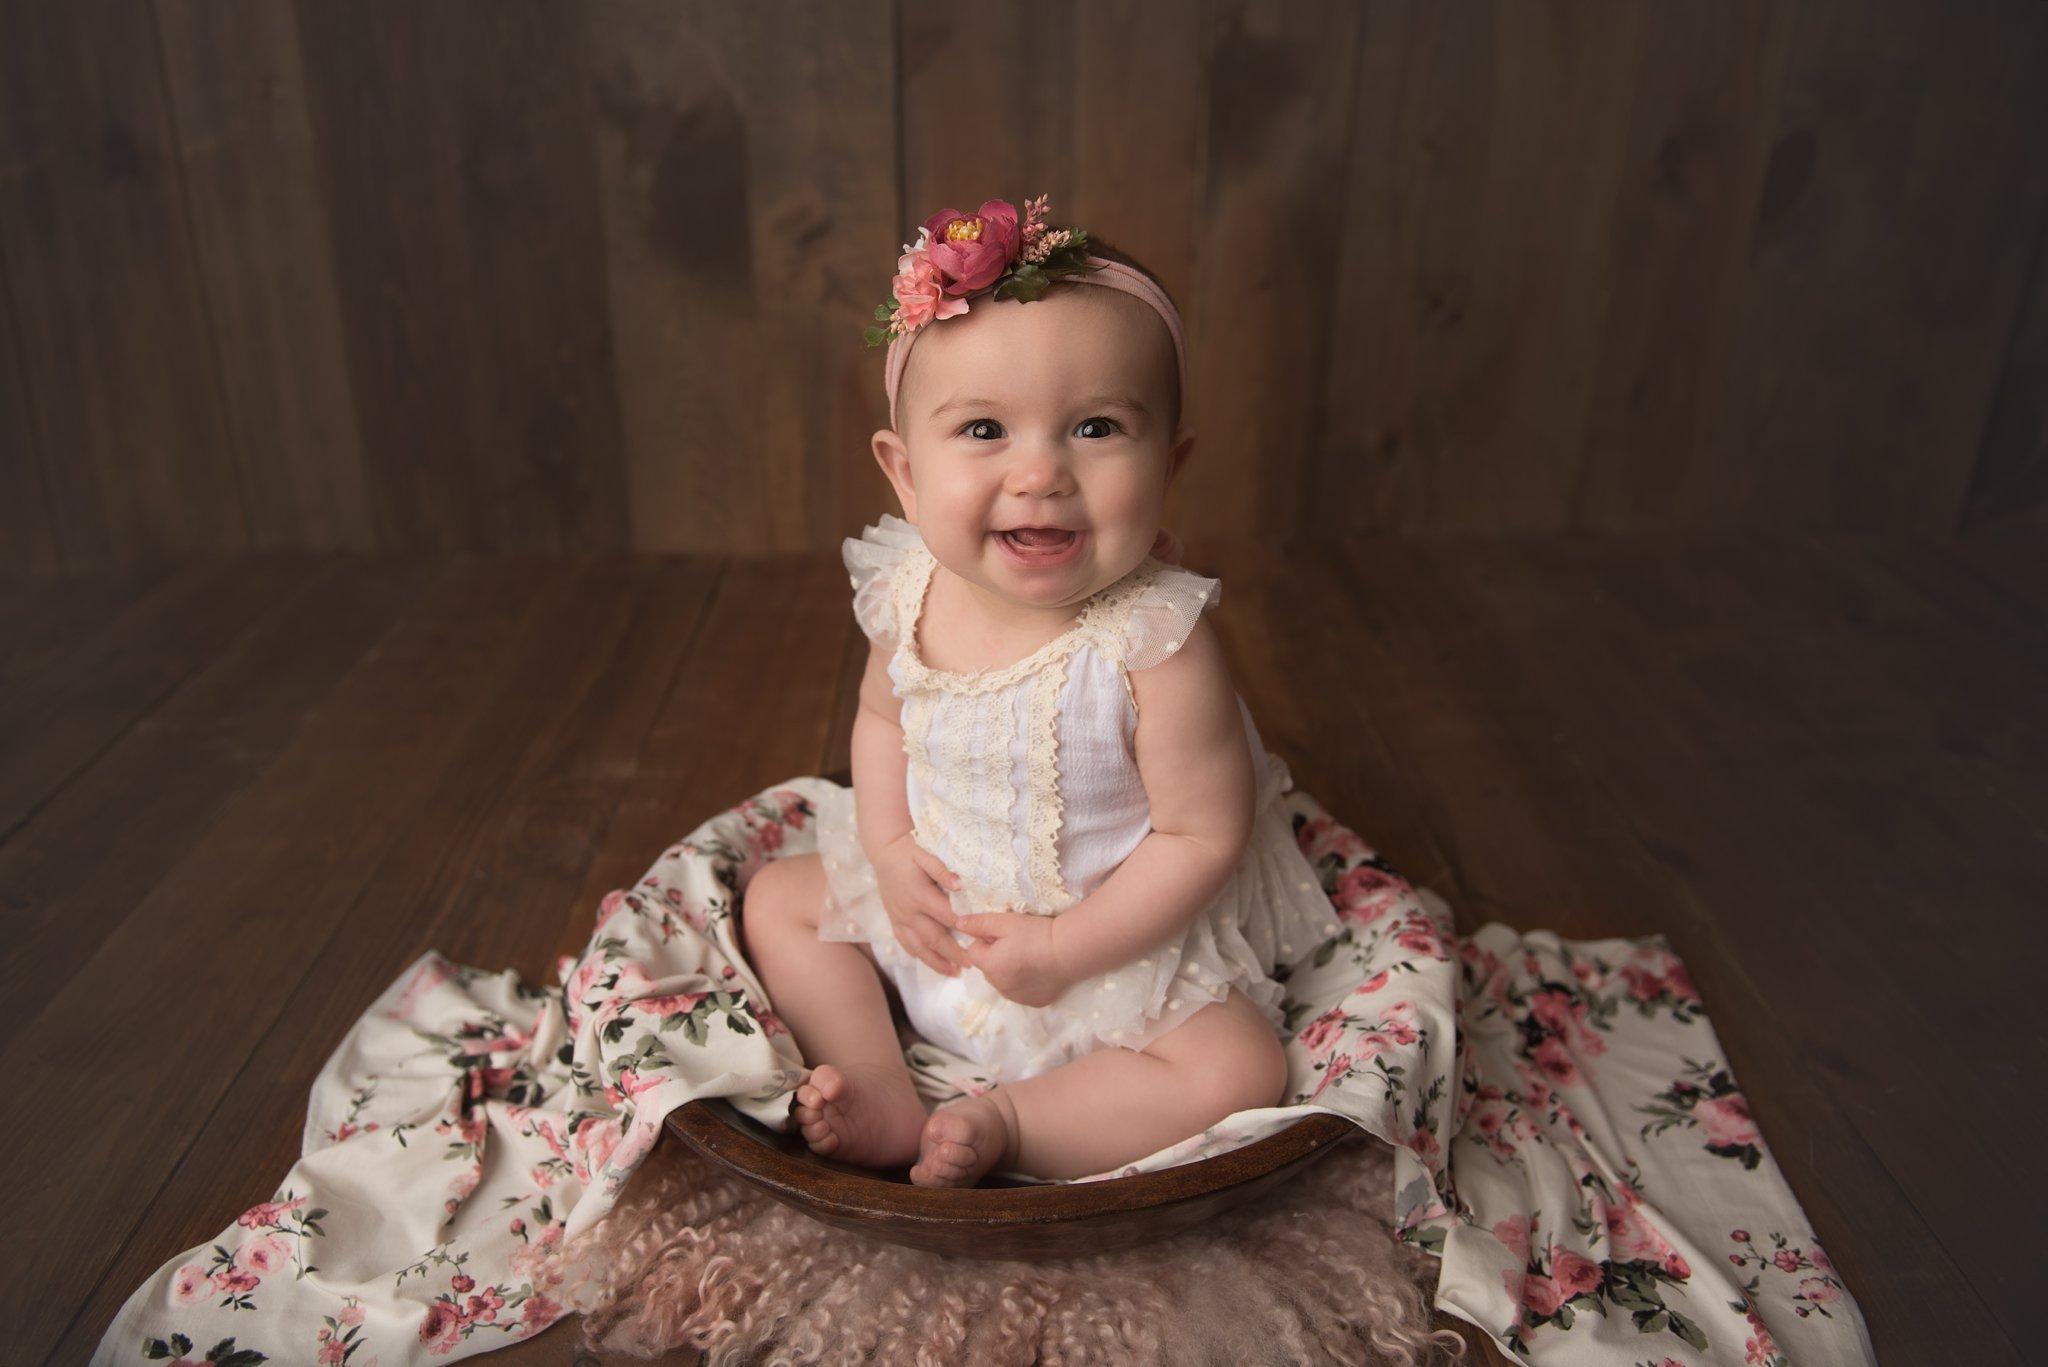 babyphotographer-columbusohio-jacquelinemariephotography_0117.jpg